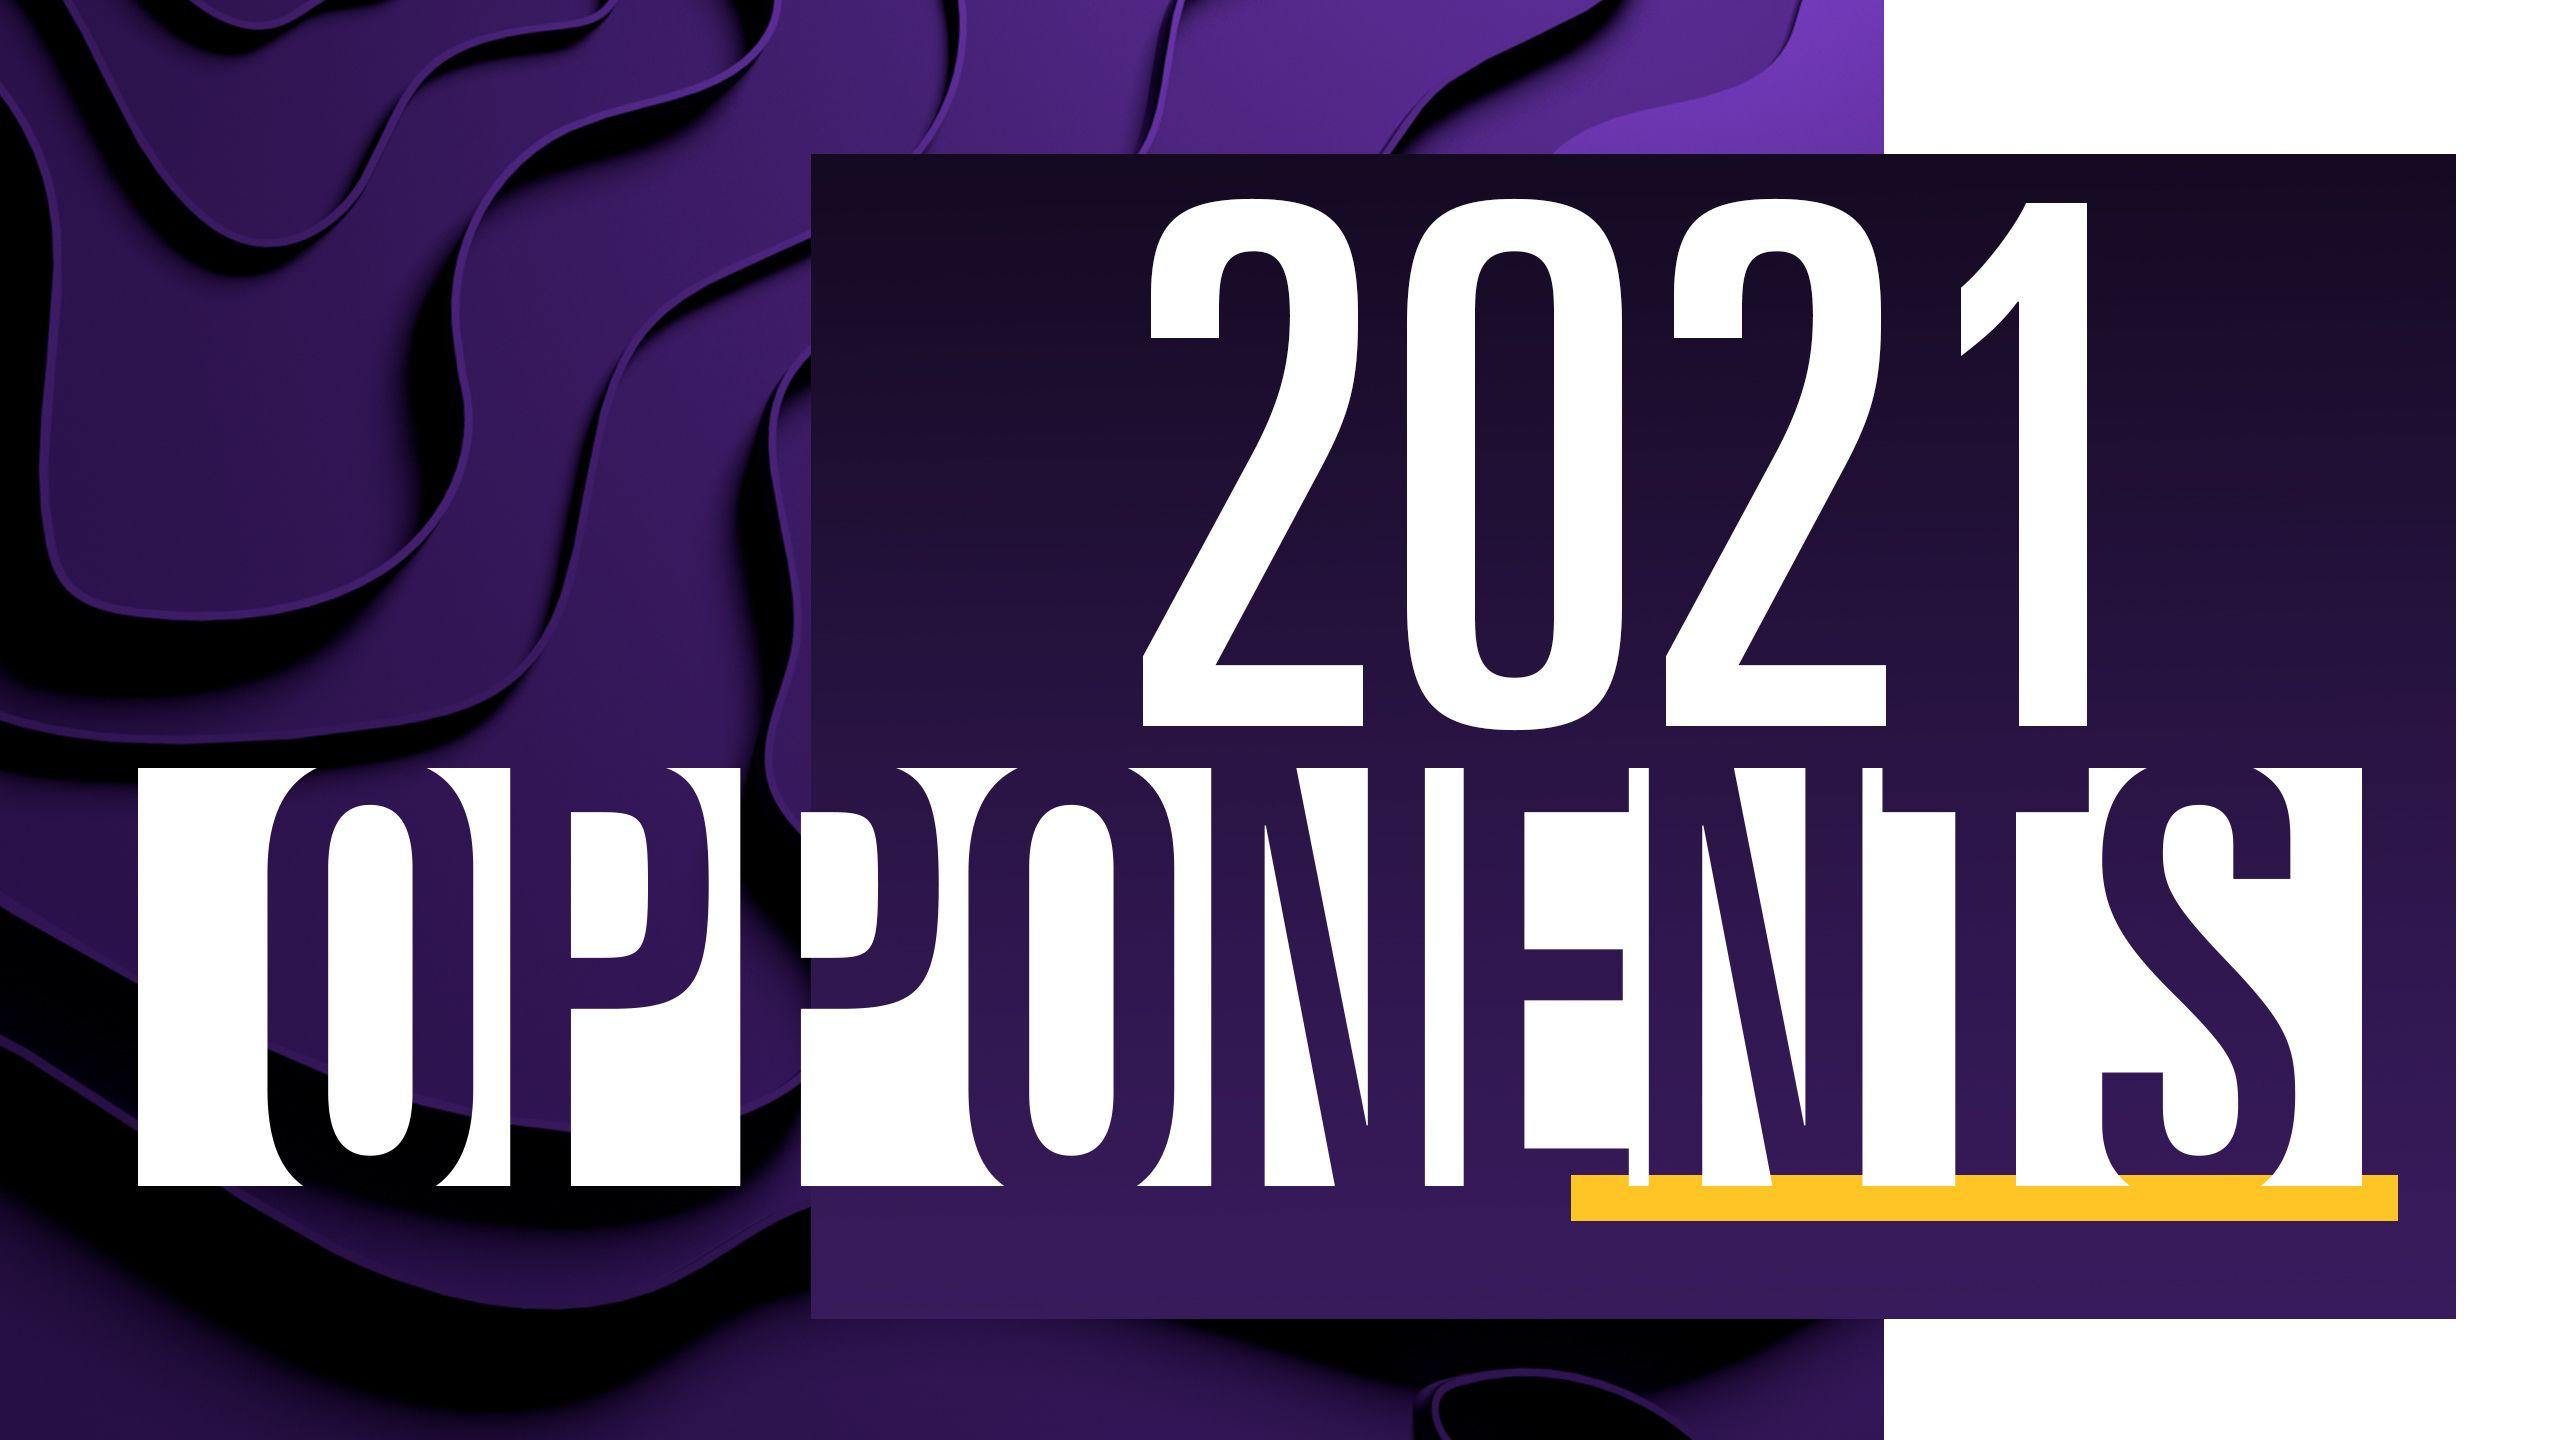 2021_Opponents_Header_2560x1440